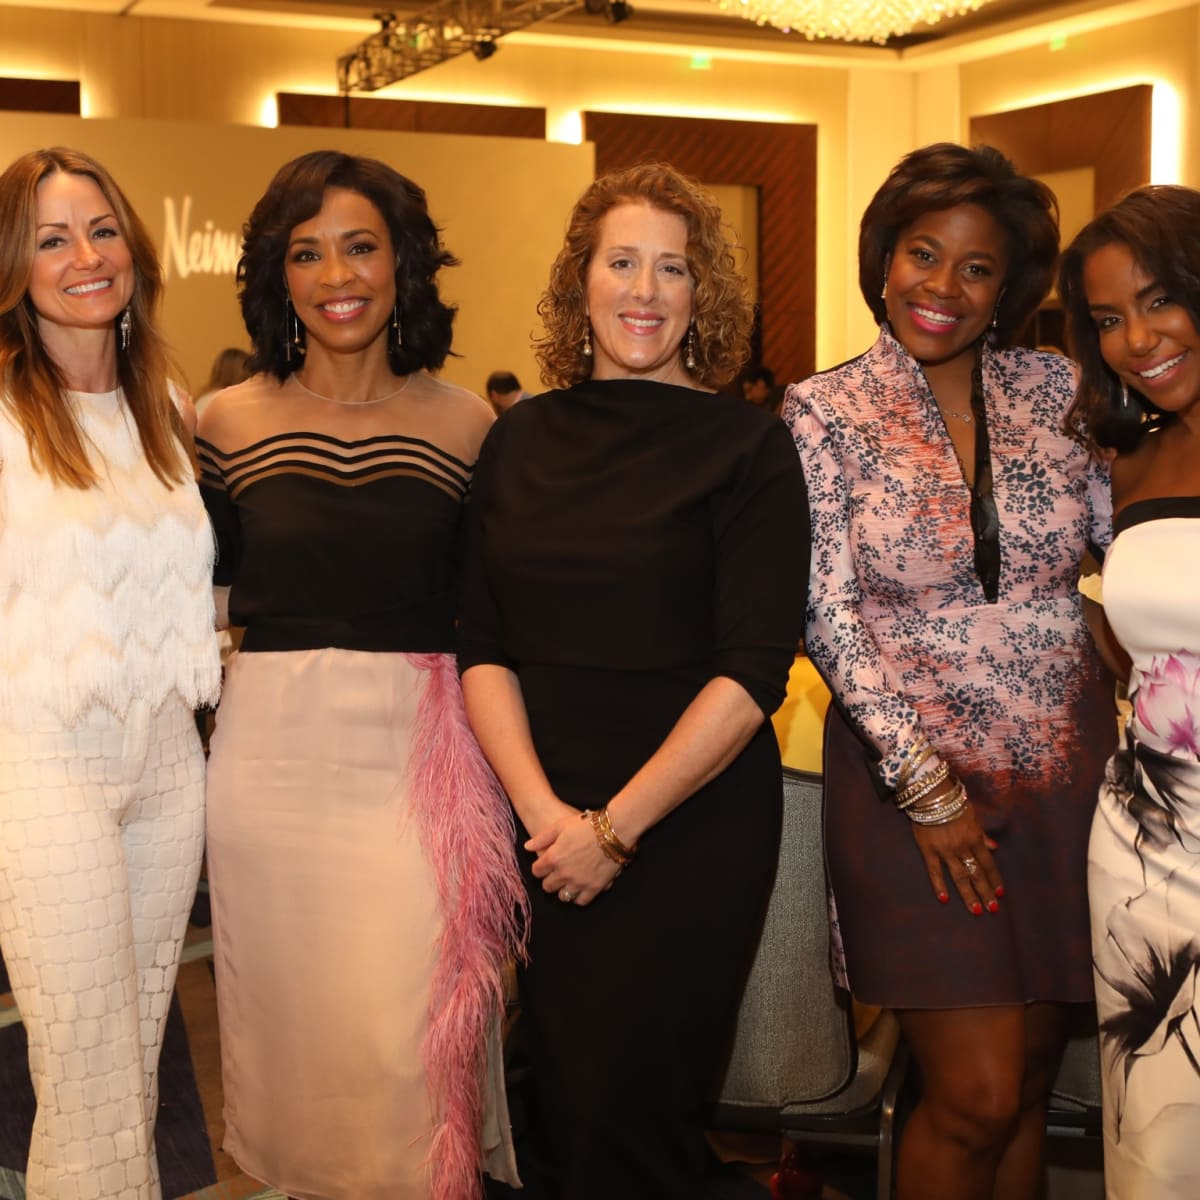 Best Dressed Luncheon 2017, Lucinda Loya, Gina Gasto Elie, Shelly Hendry, Kafi Slaughter,Tiffany Smith